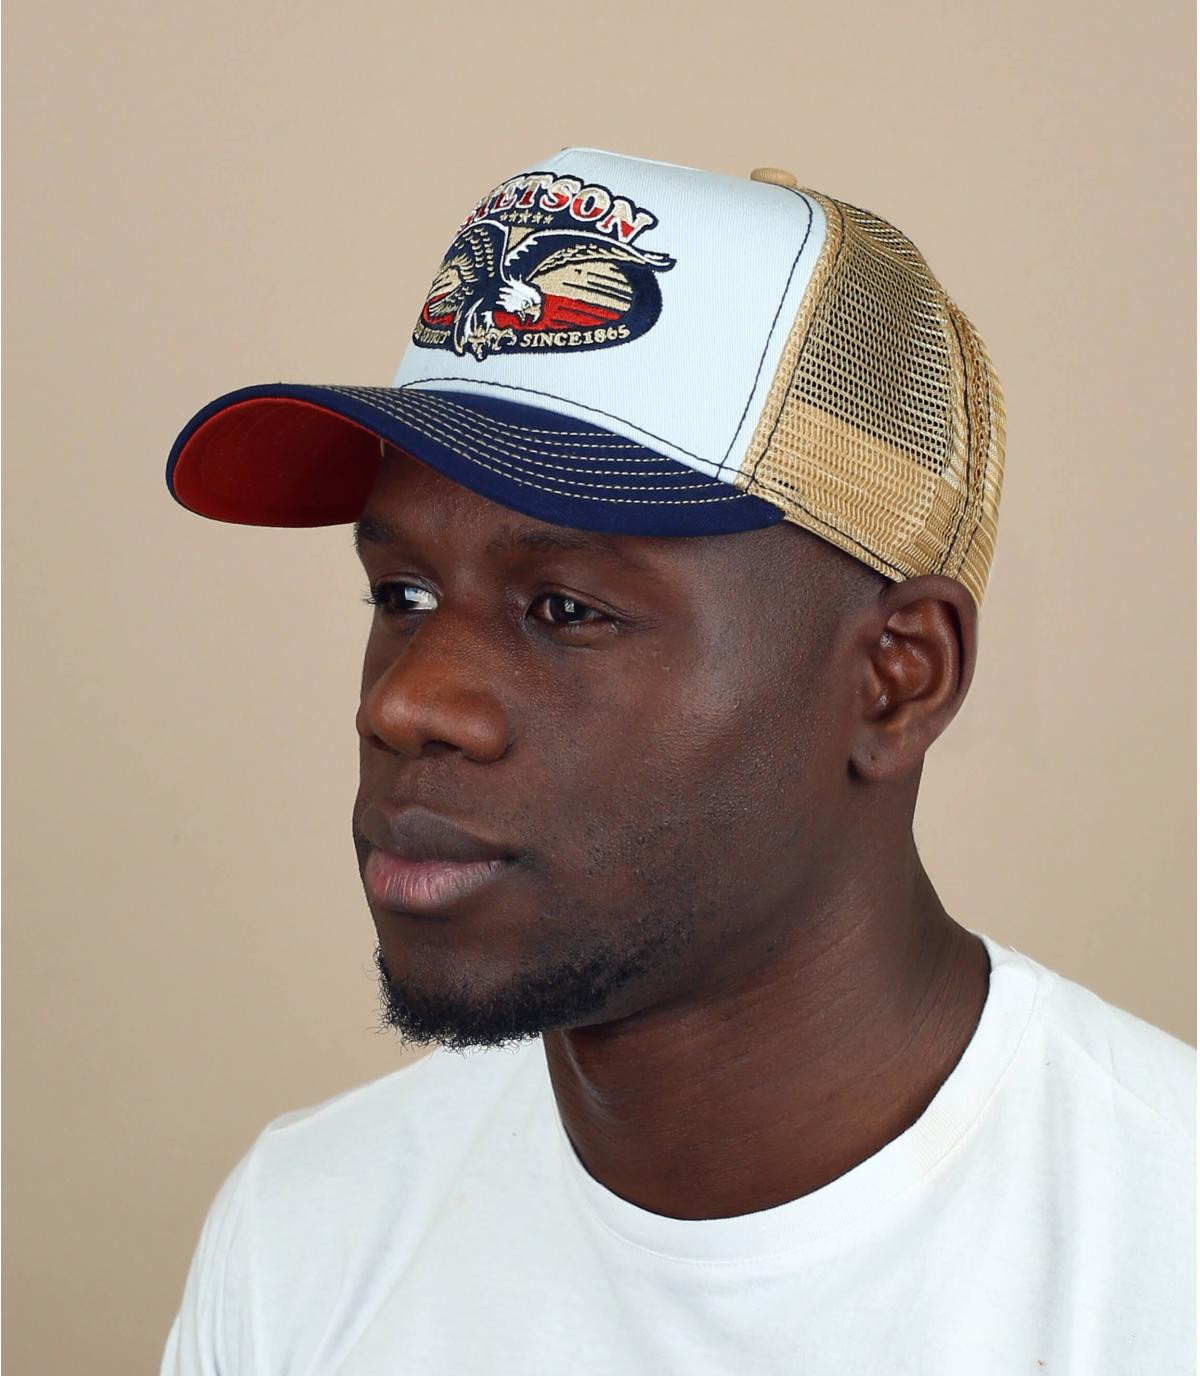 Stetson eagle trucker cap